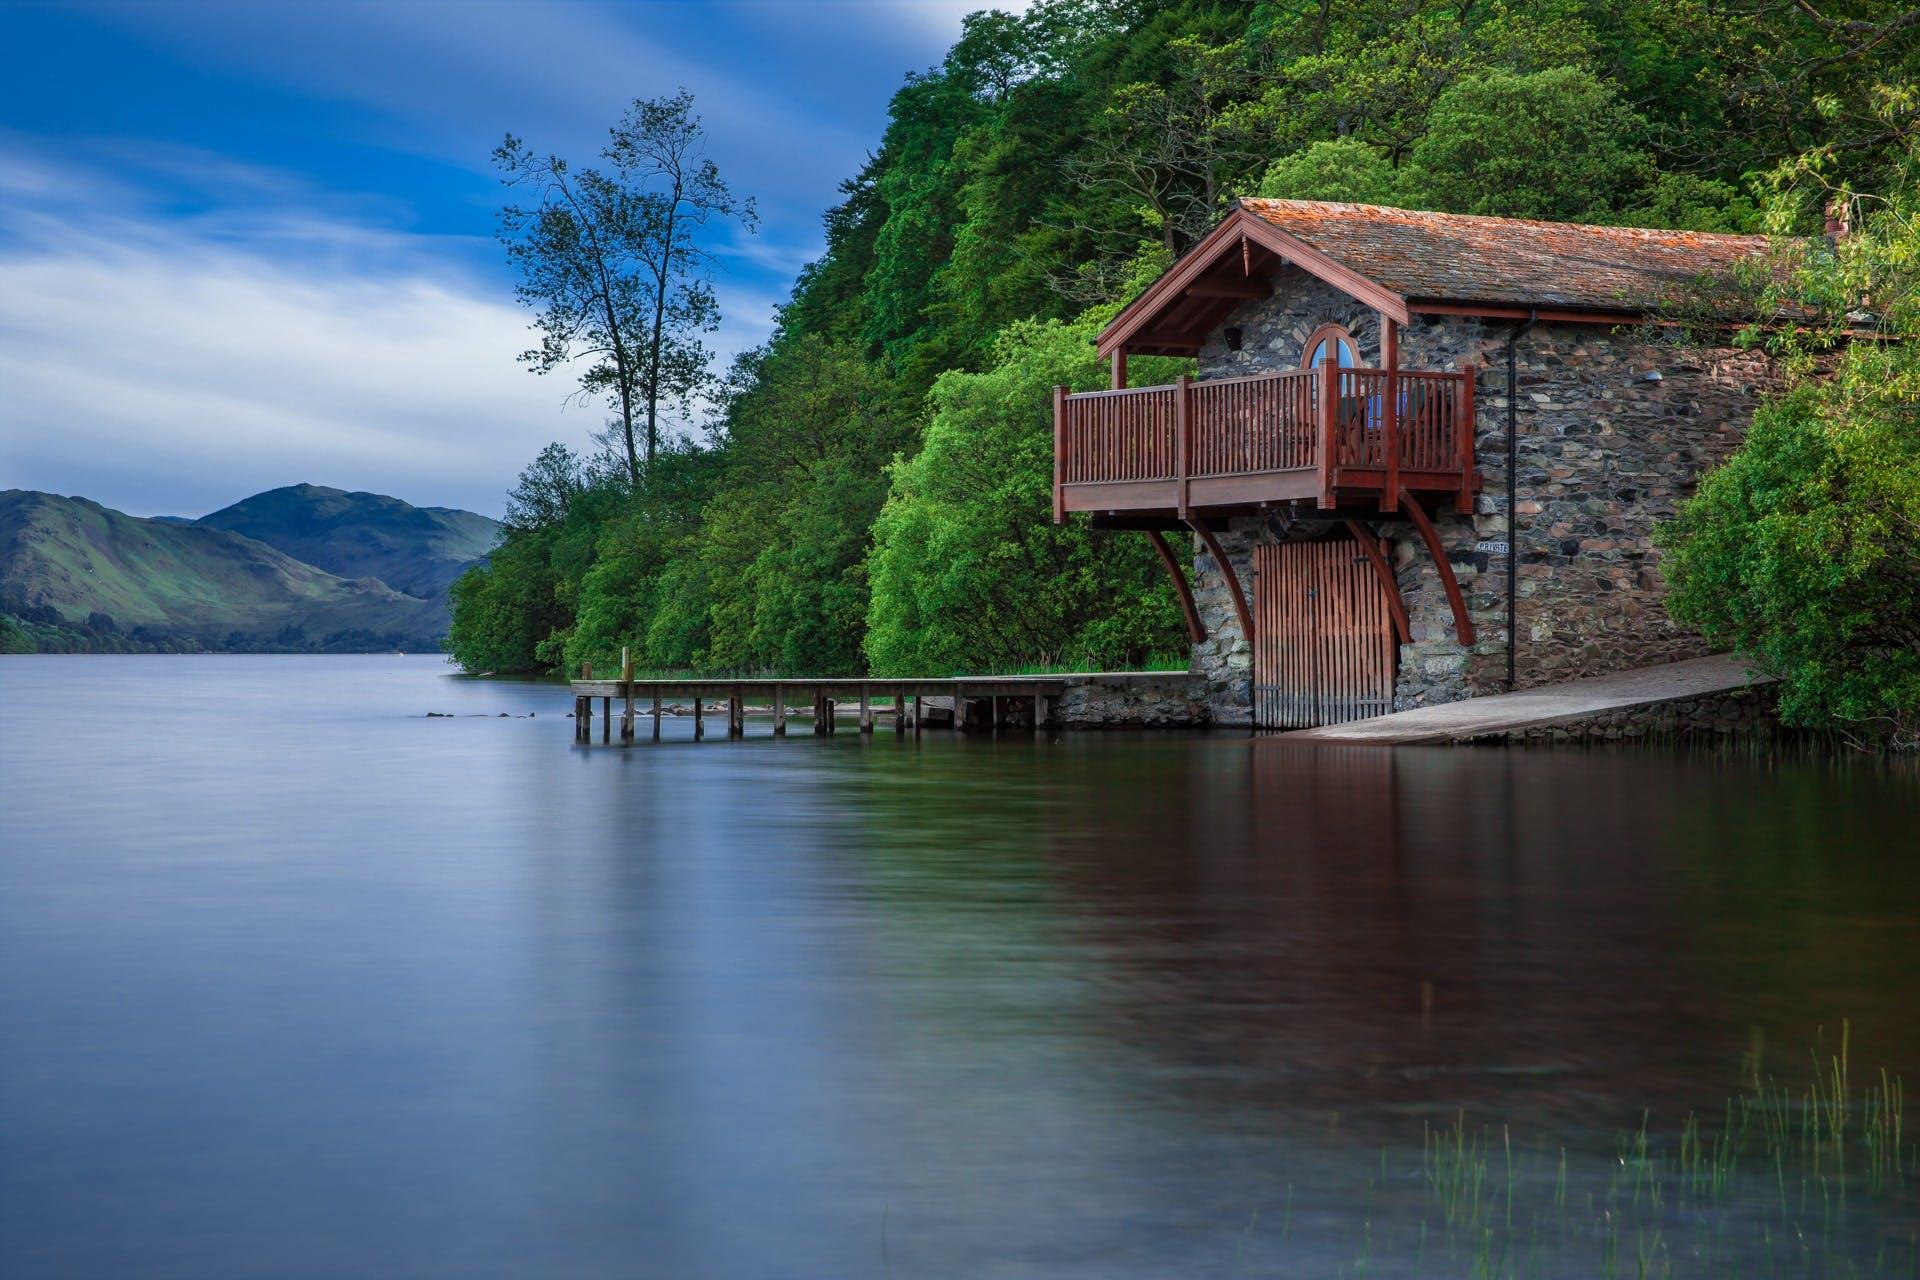 https://images.pexels.com/photos/65225/boat-house-cottage-waters-lake-65225.jpeg?auto=compress&cs=tinysrgb&dpr=2&h=350